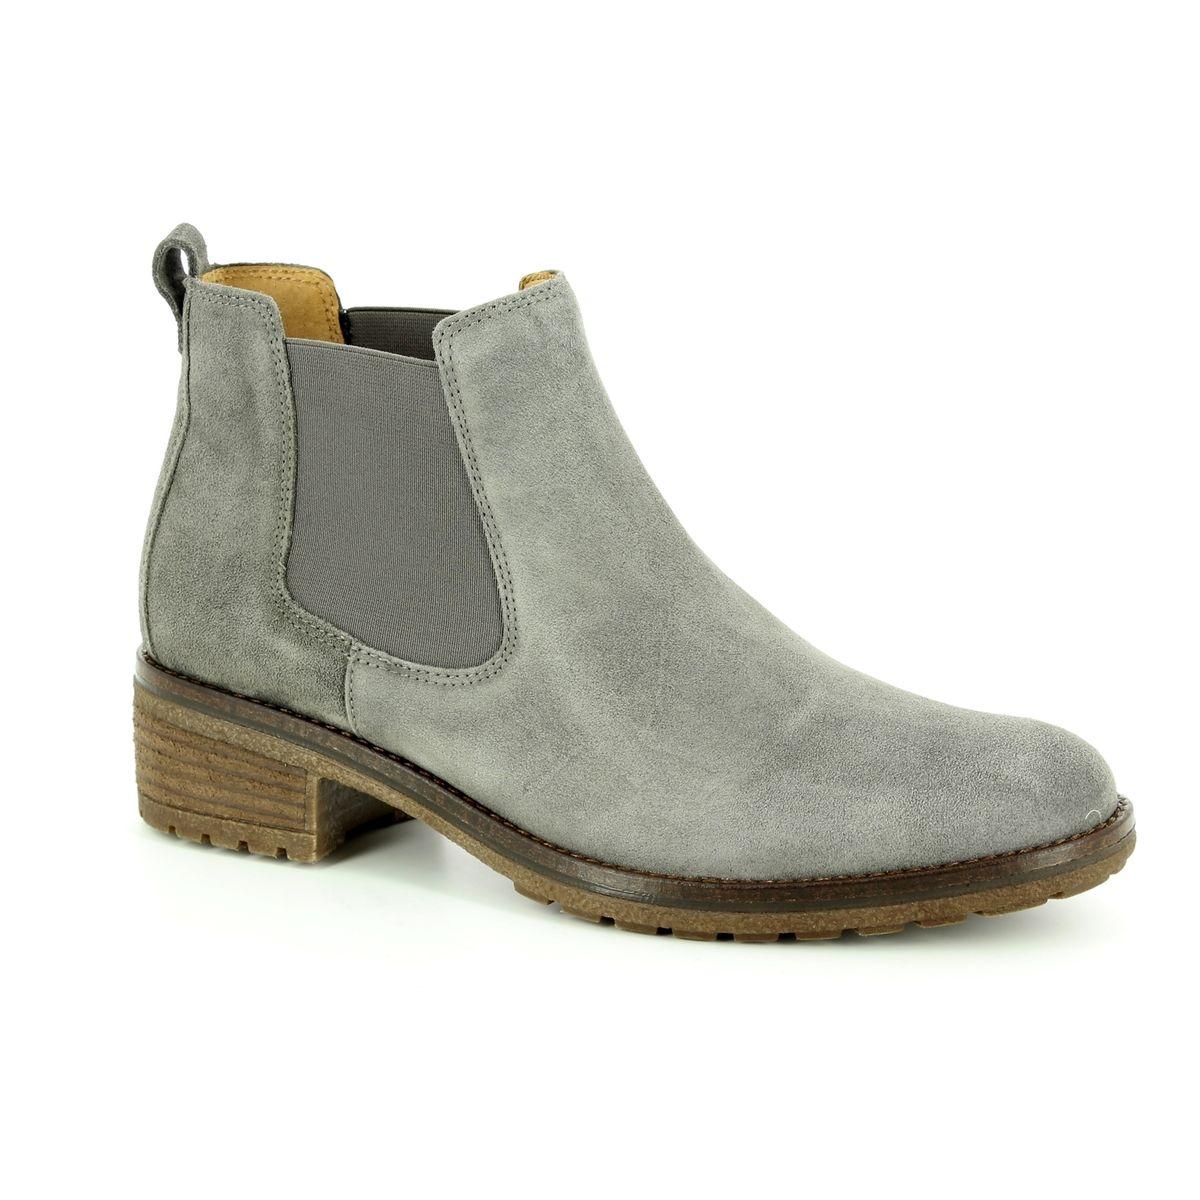 best website 89936 c01c3 91.610.12 Brilliant at Begg Shoes & Bags